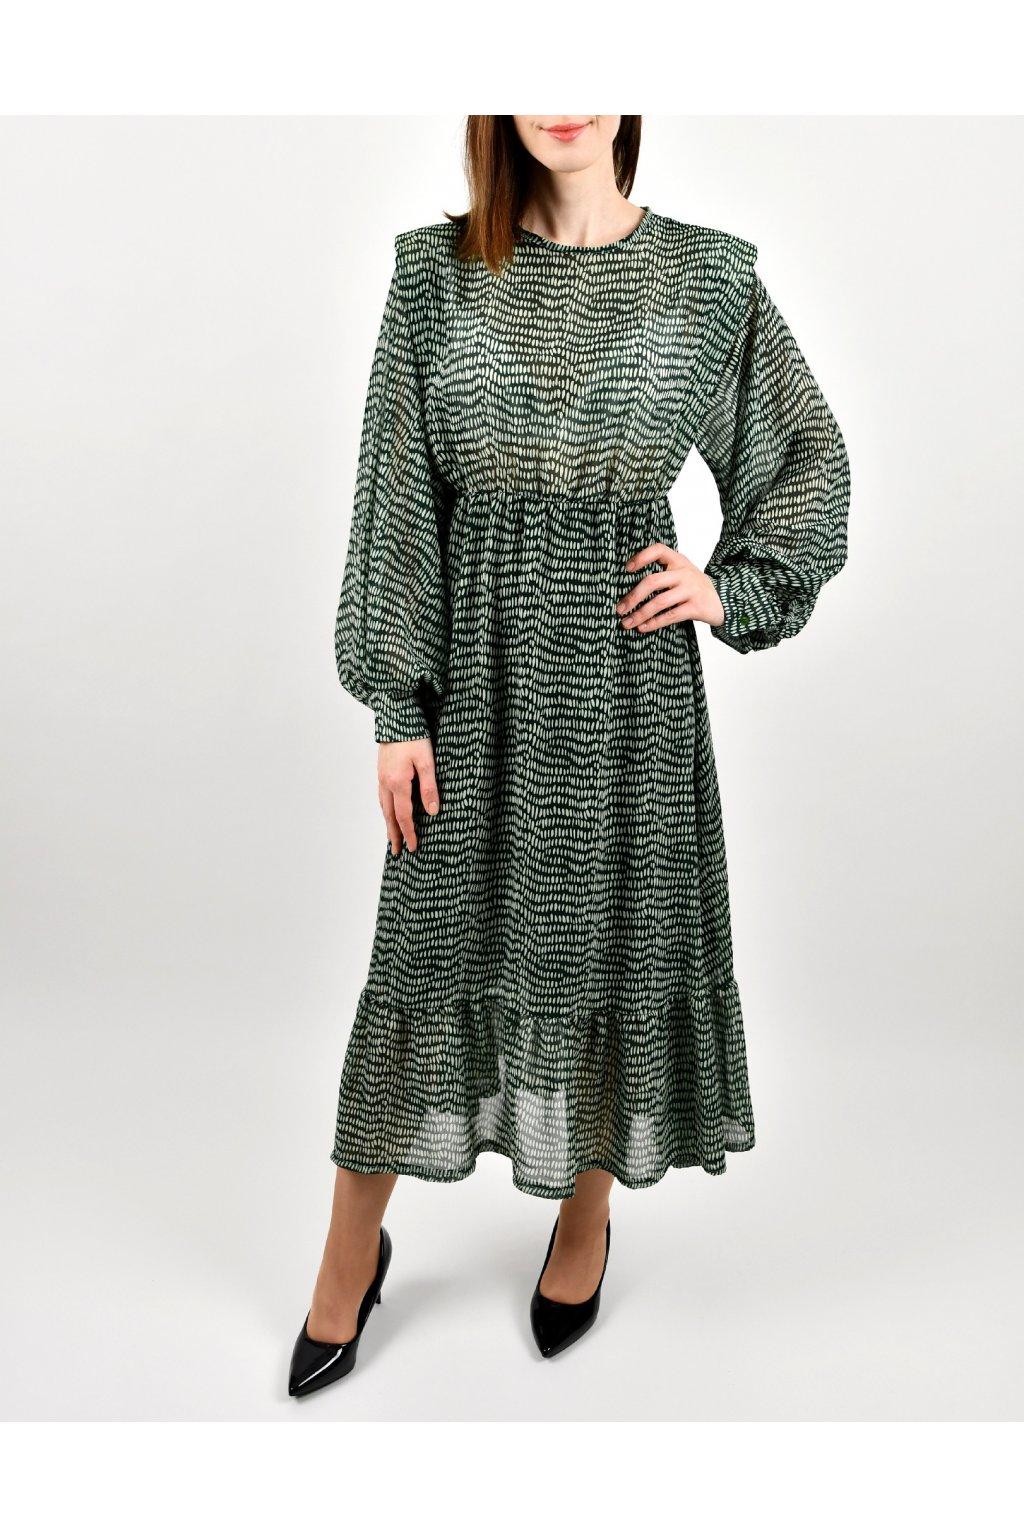 Šaty s vypchávkami - VERDE PRINT LONG